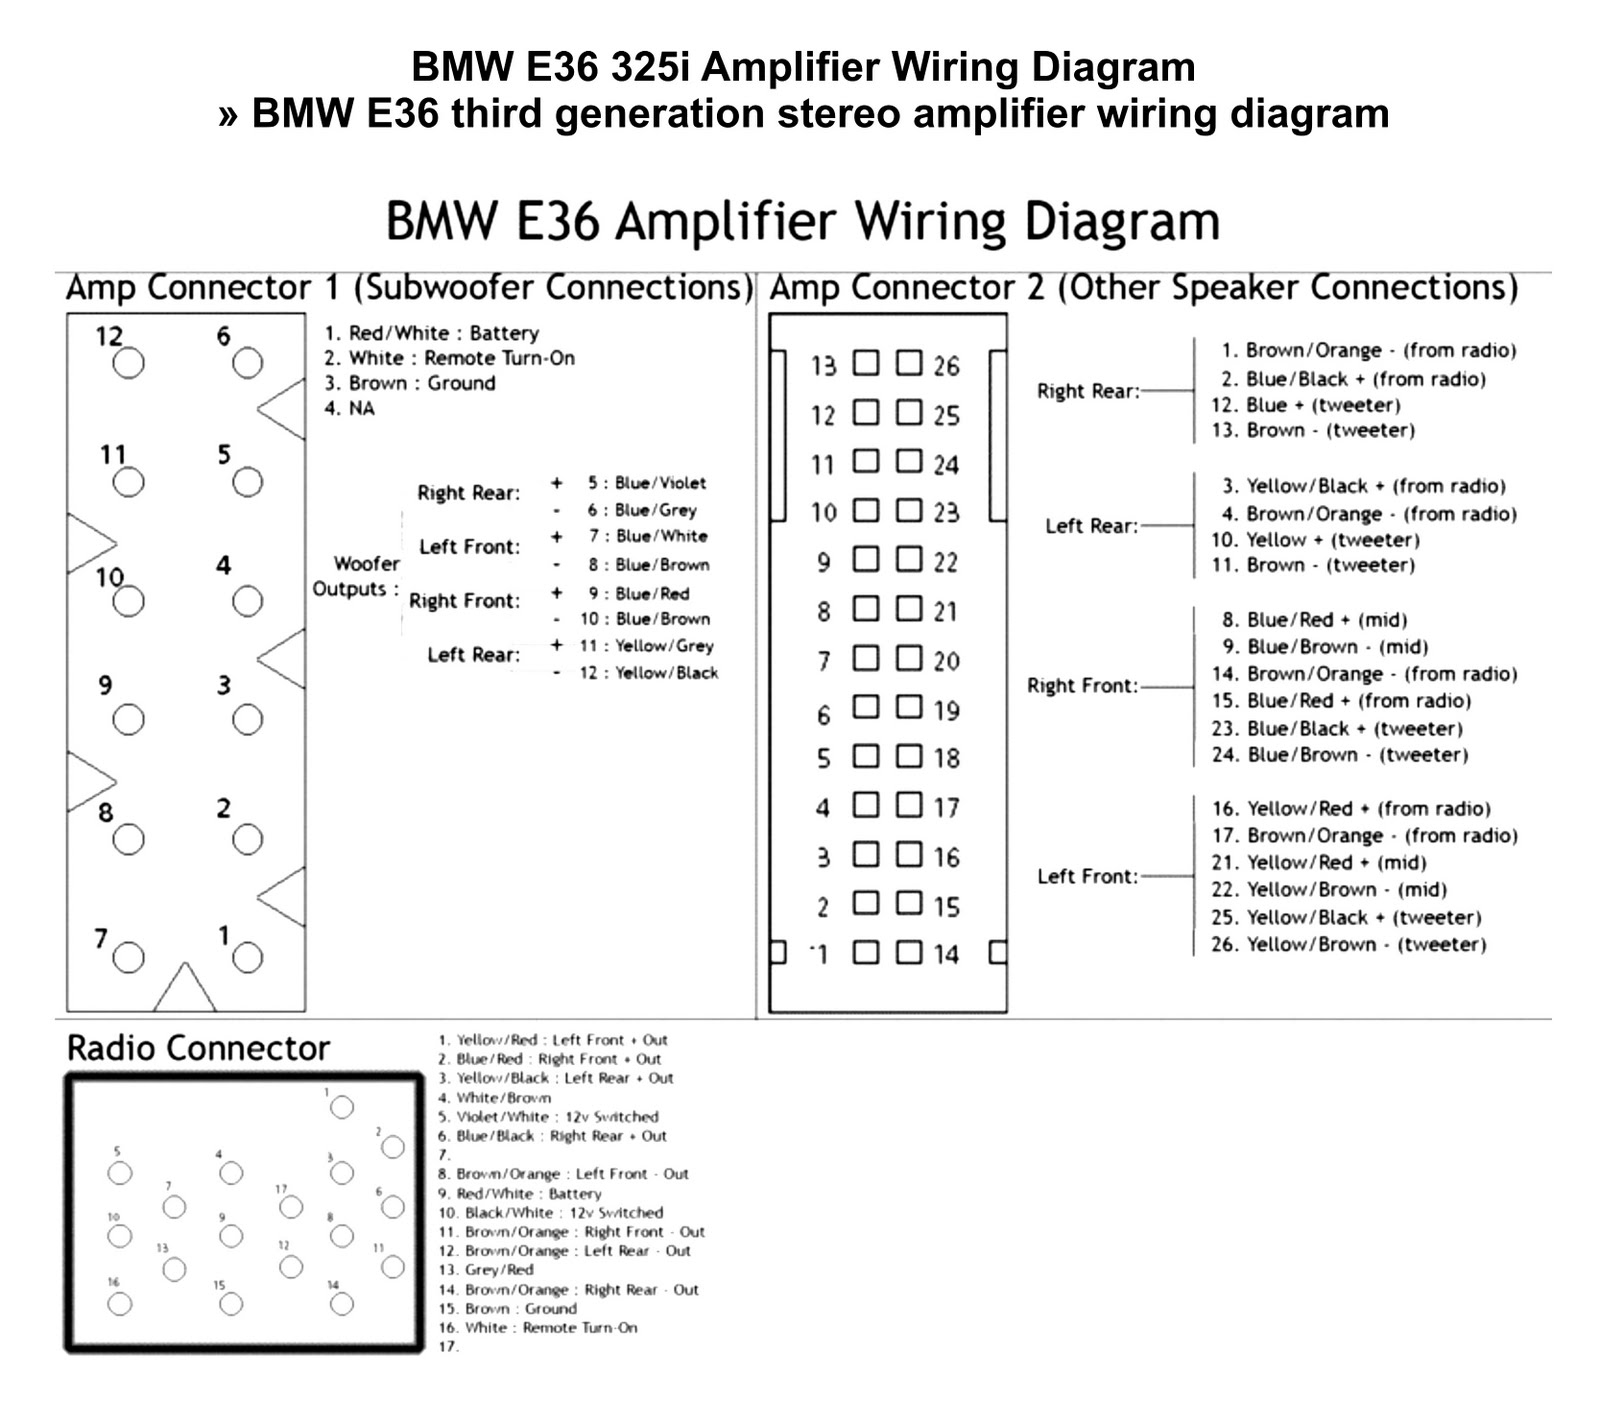 bmw e60 headlight wiring diagram wiring diagrams schematic Dodge Avenger Radio Wiring bmw e60 stereo wiring diagram best wiring library 2001 bmw 525i radio wiring diagram bmw e36